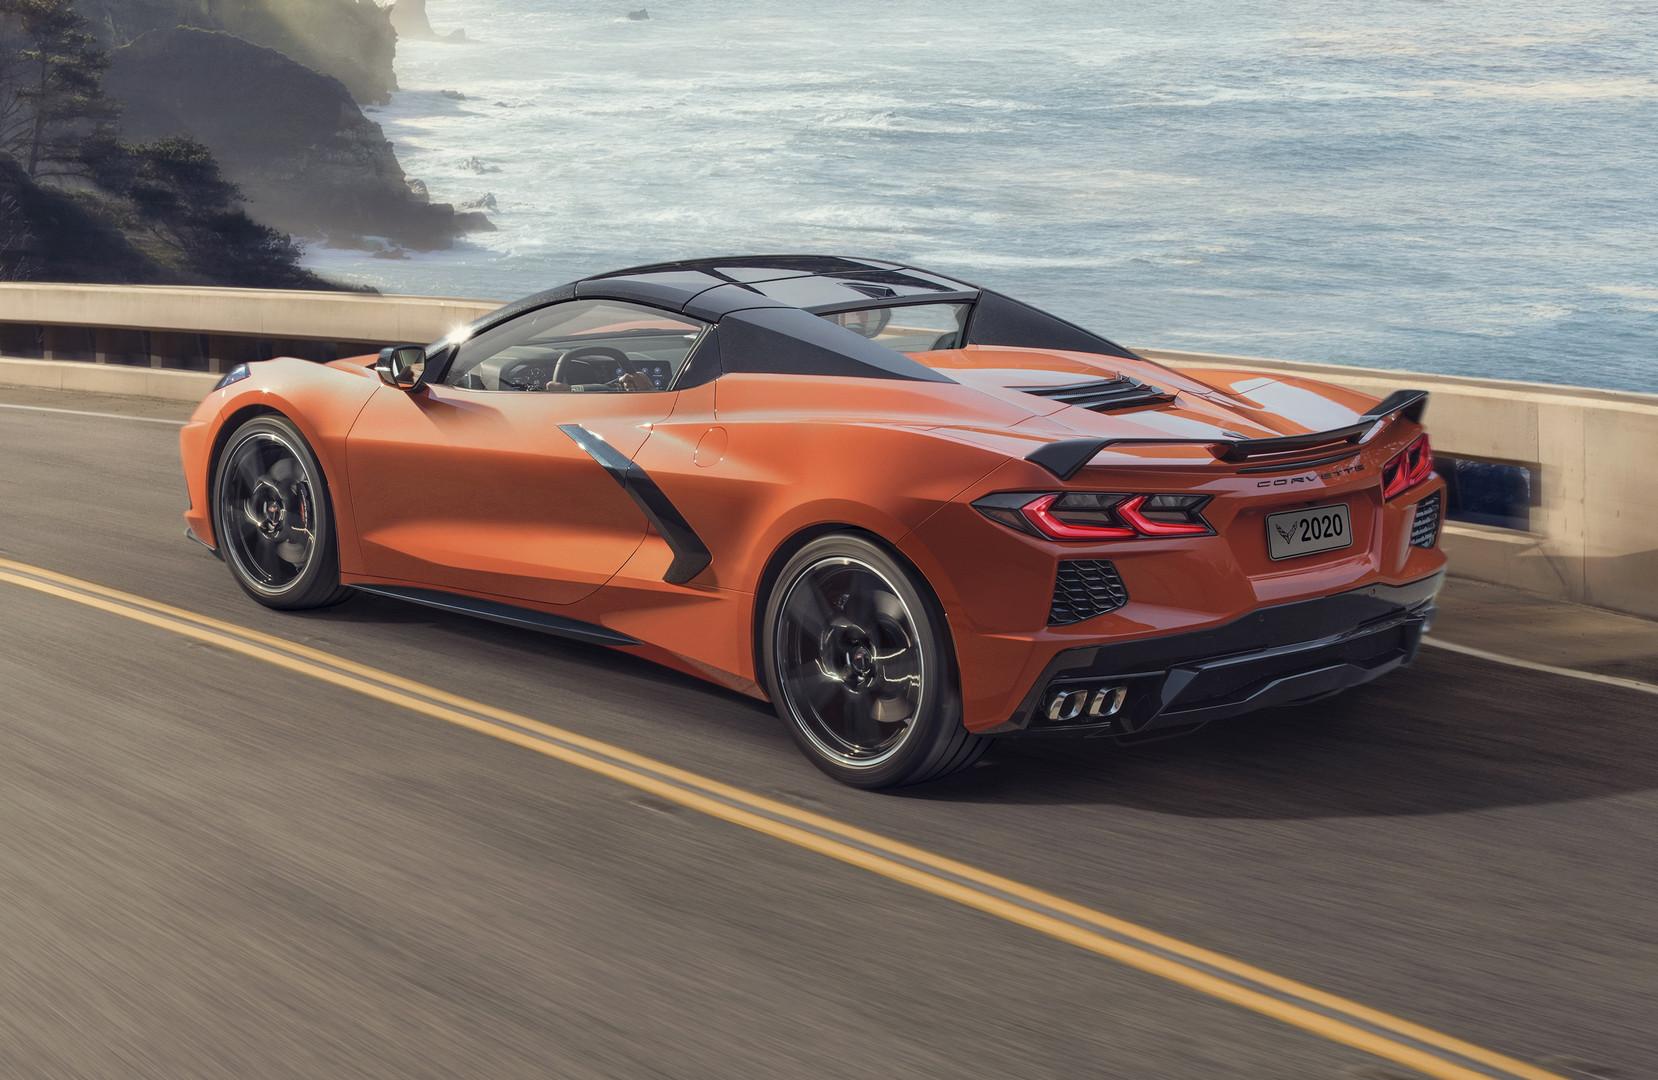 2020 Corvette Convertible Hardtop